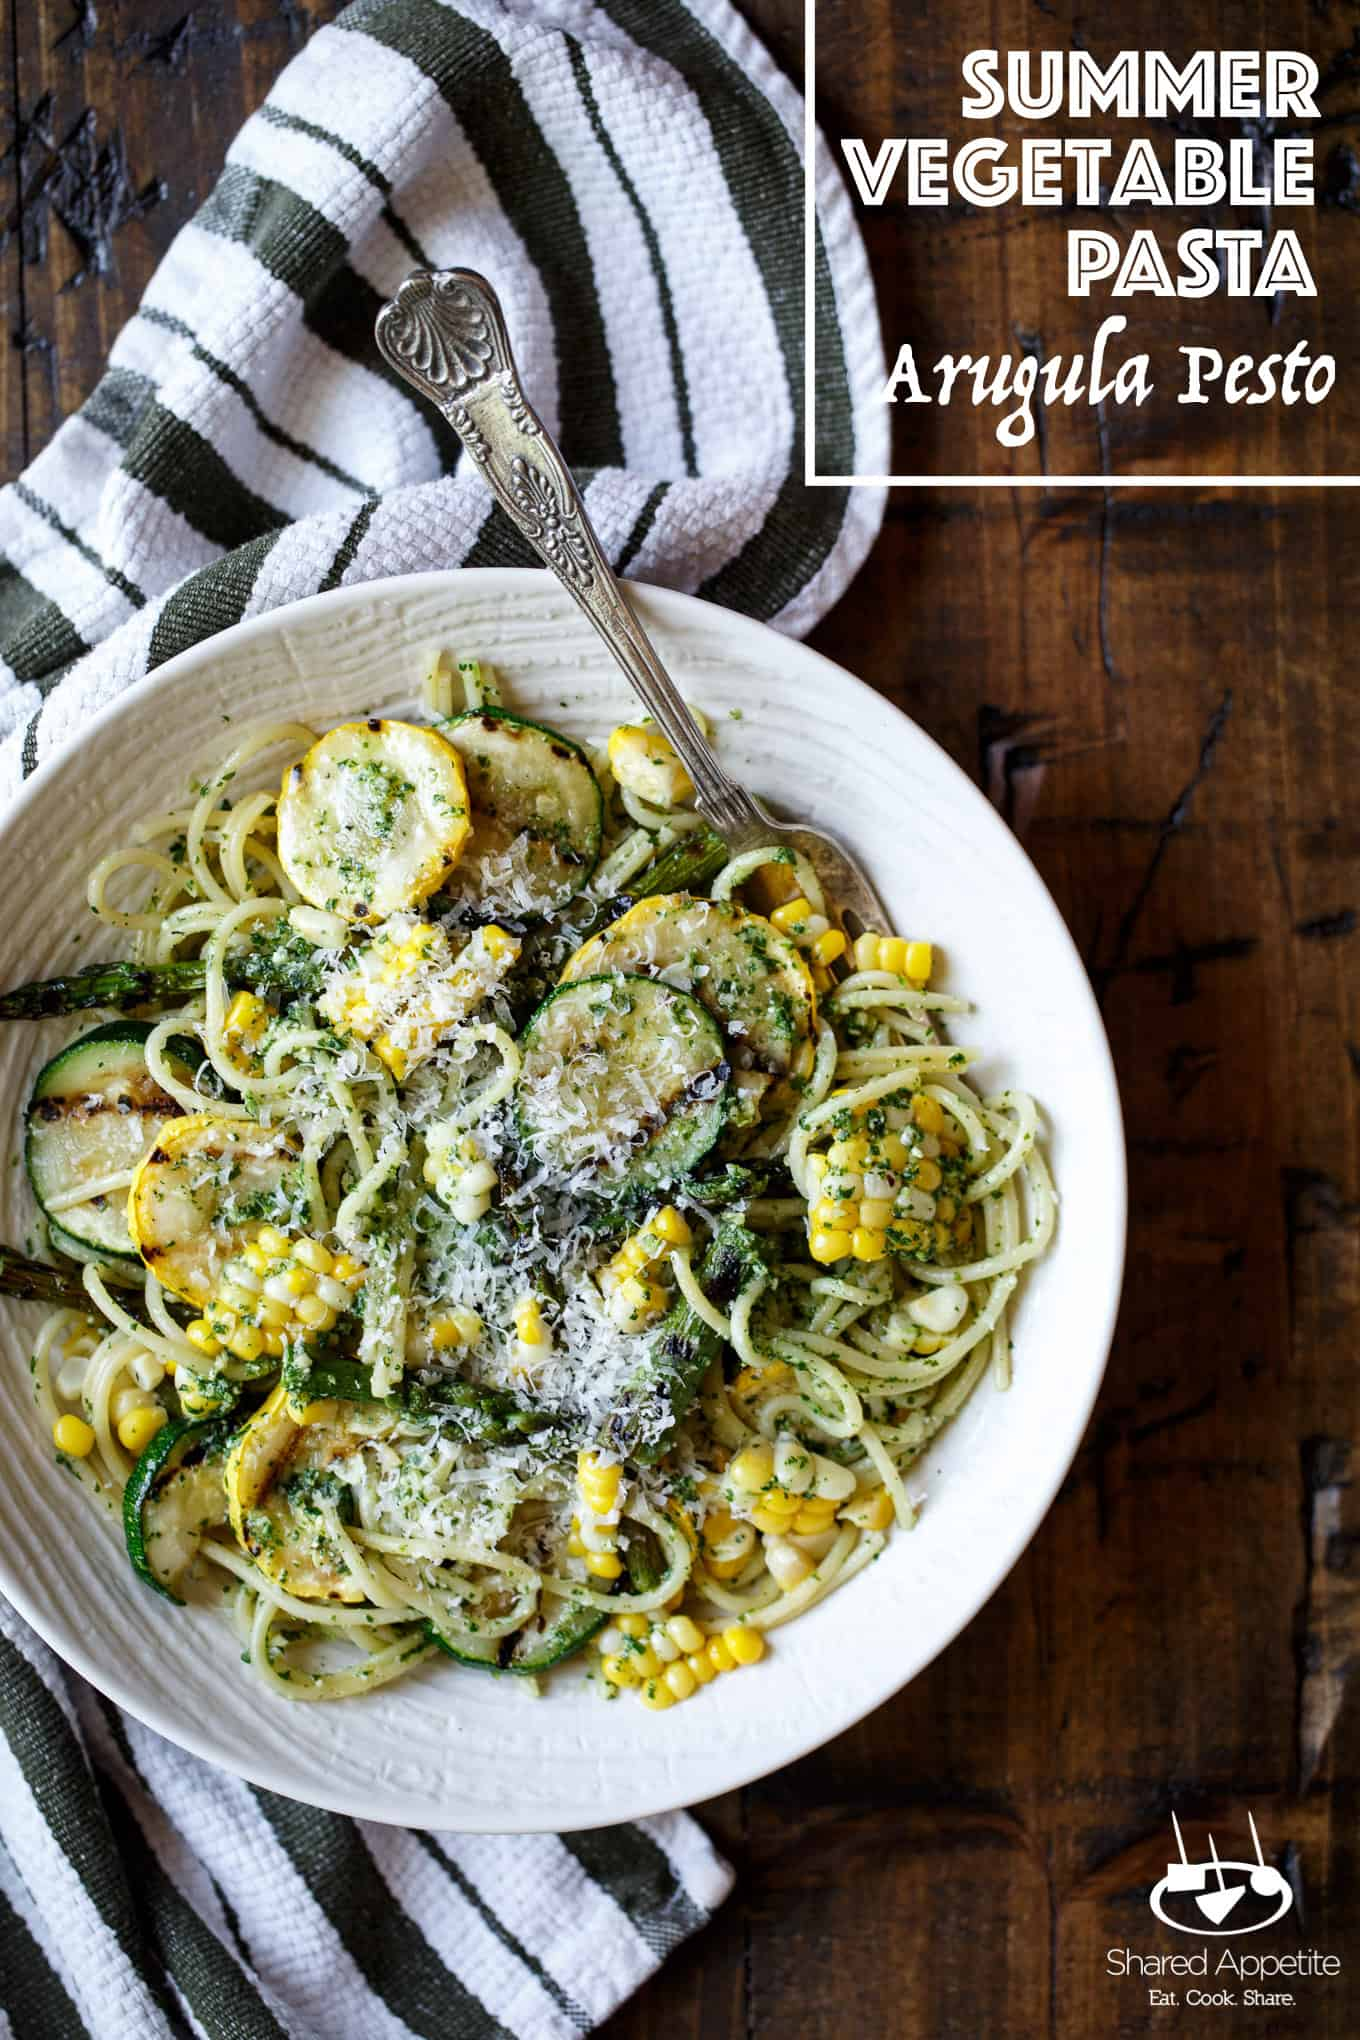 28 Best - Summer Vegetable Pasta With Arugula Pesto Shared ...